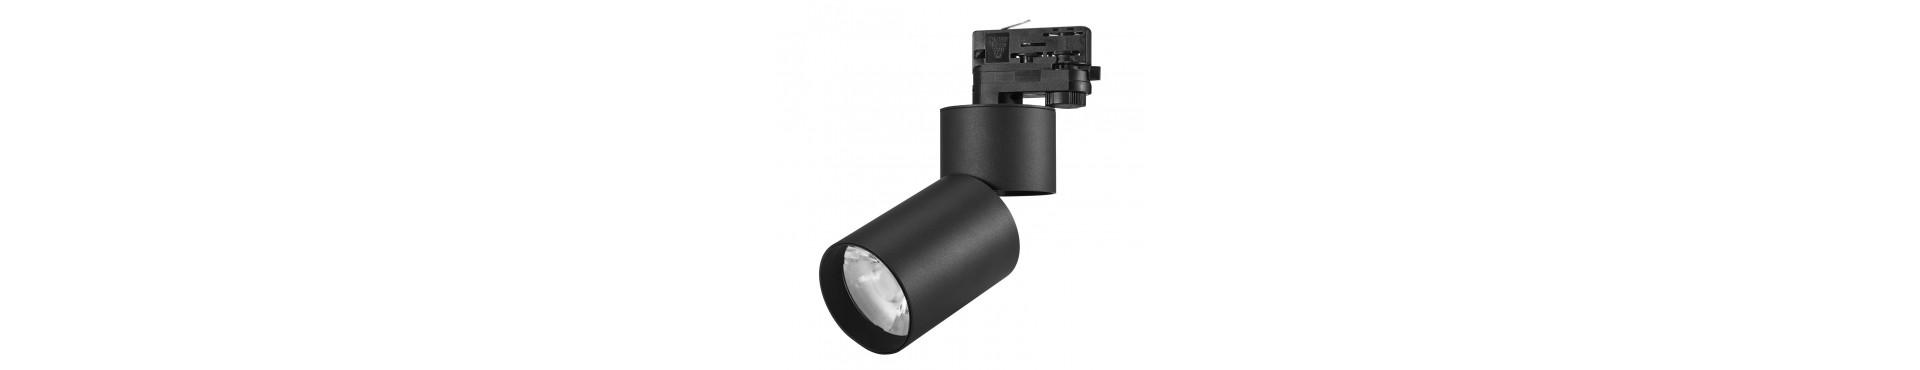 Led Track Light - darklight teknologi